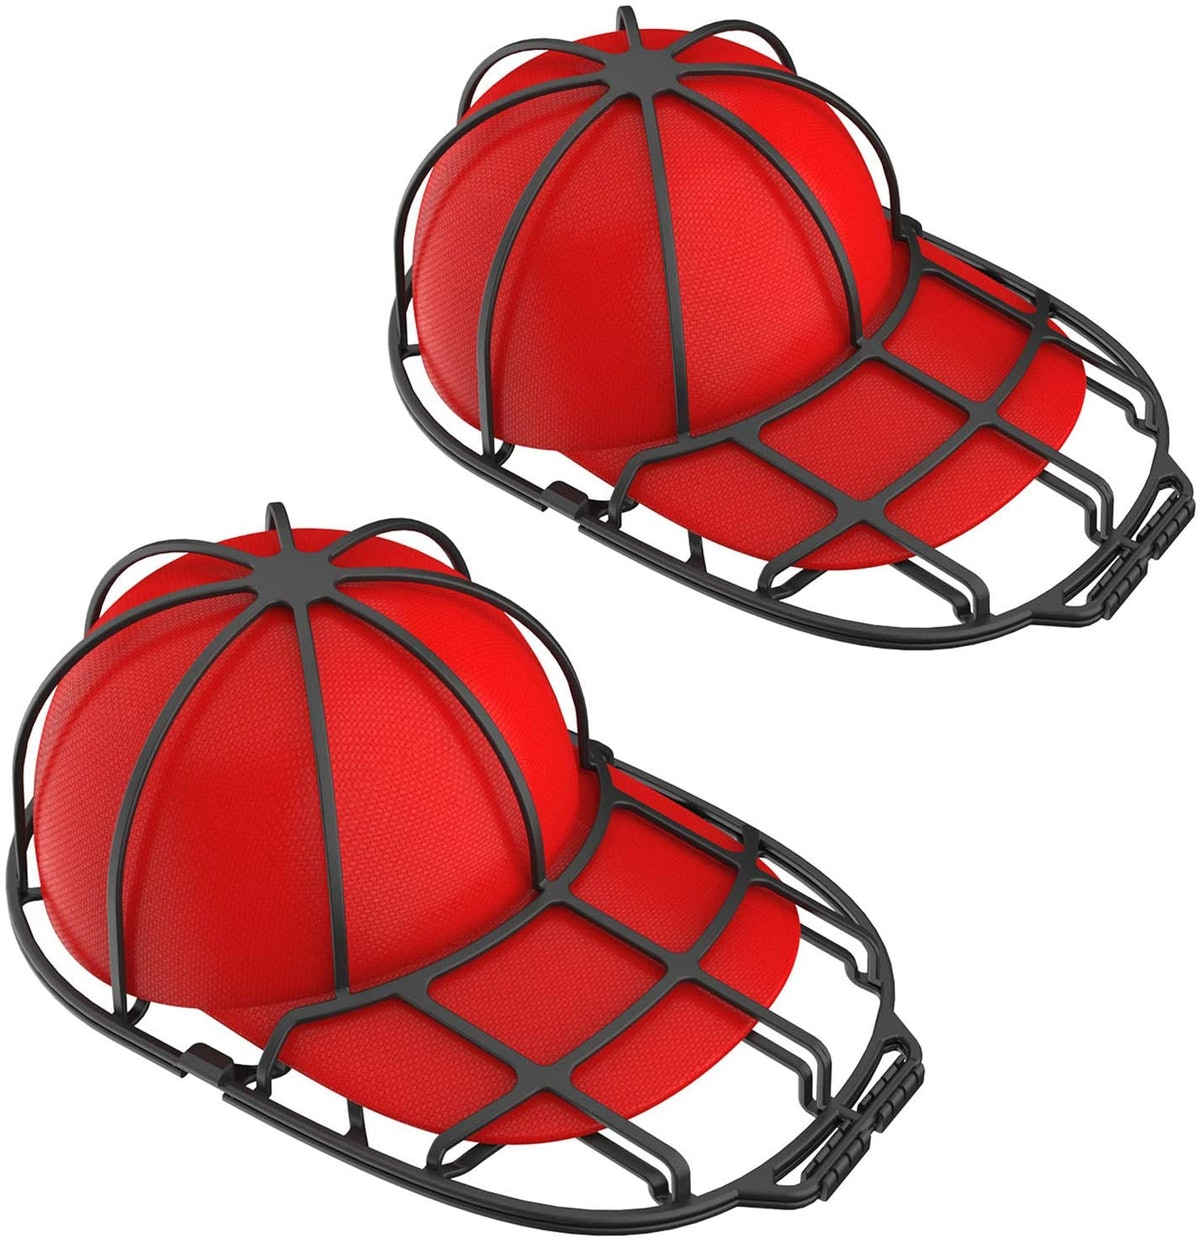 XQXA Hat Washers (2-Pack)